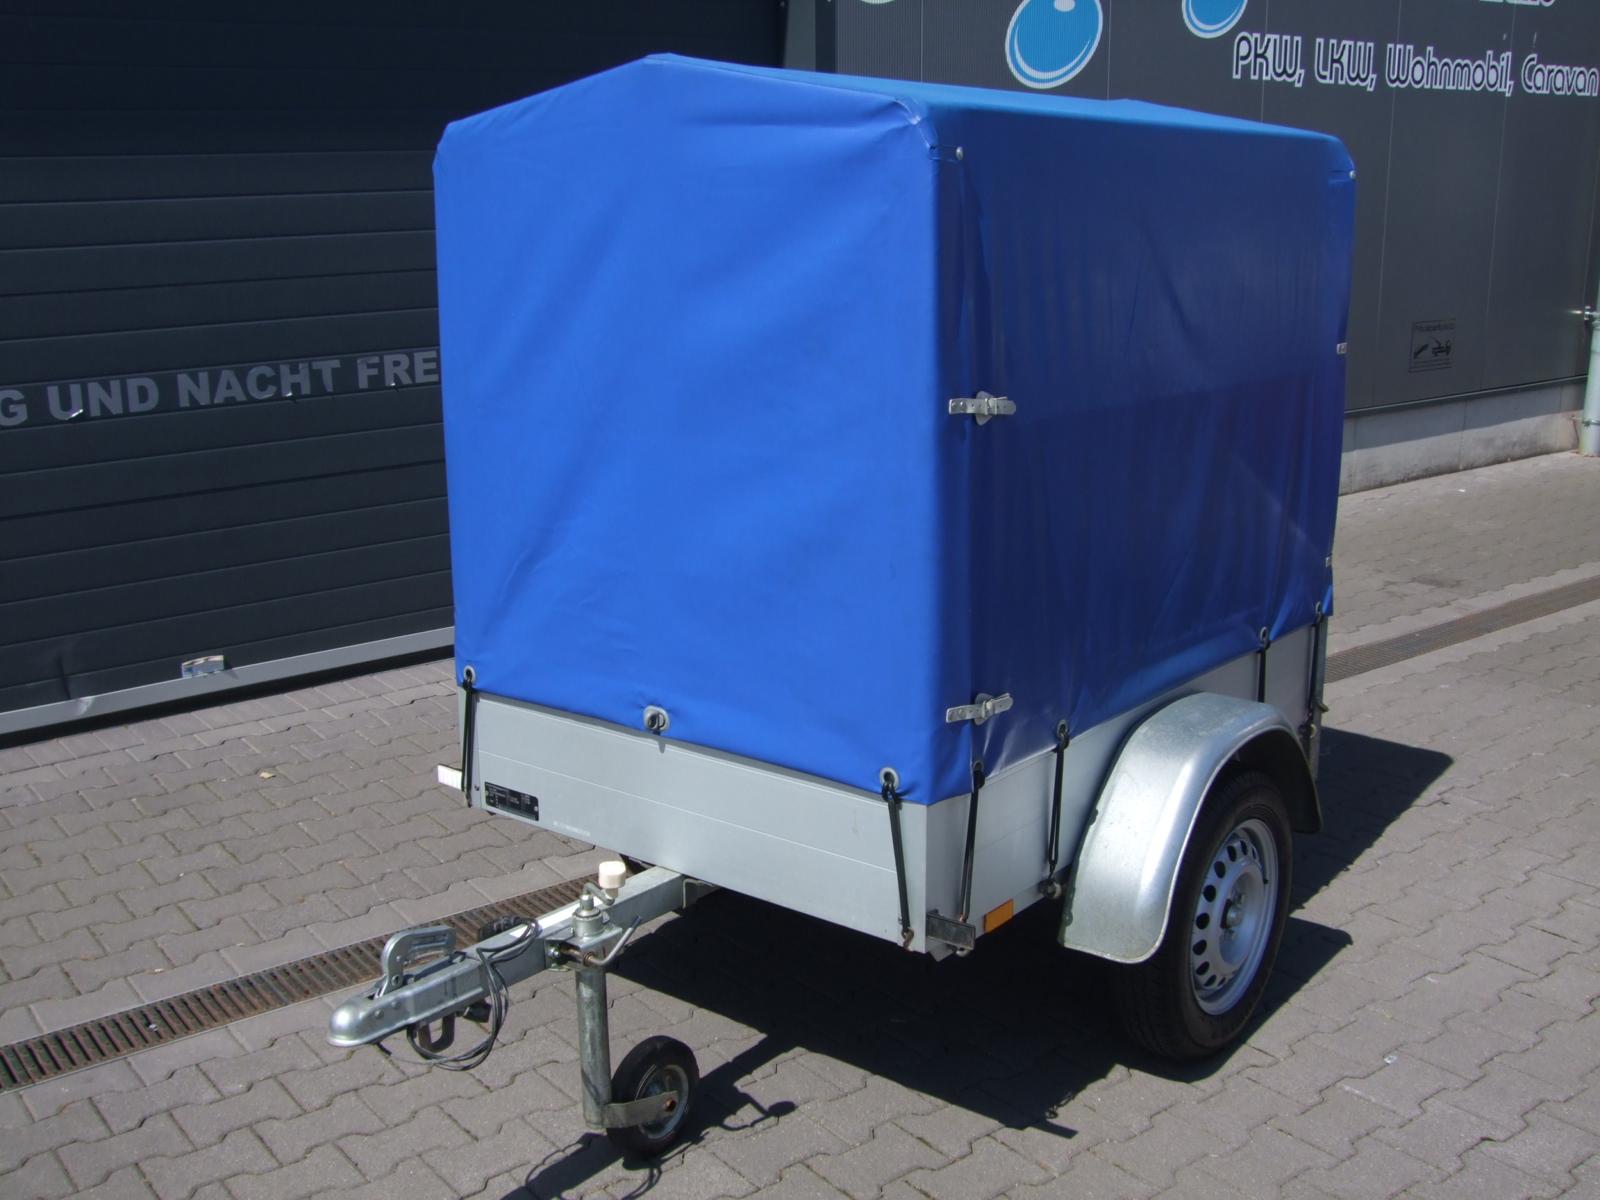 Anhängerverleih 500 kg 1,50 Meter